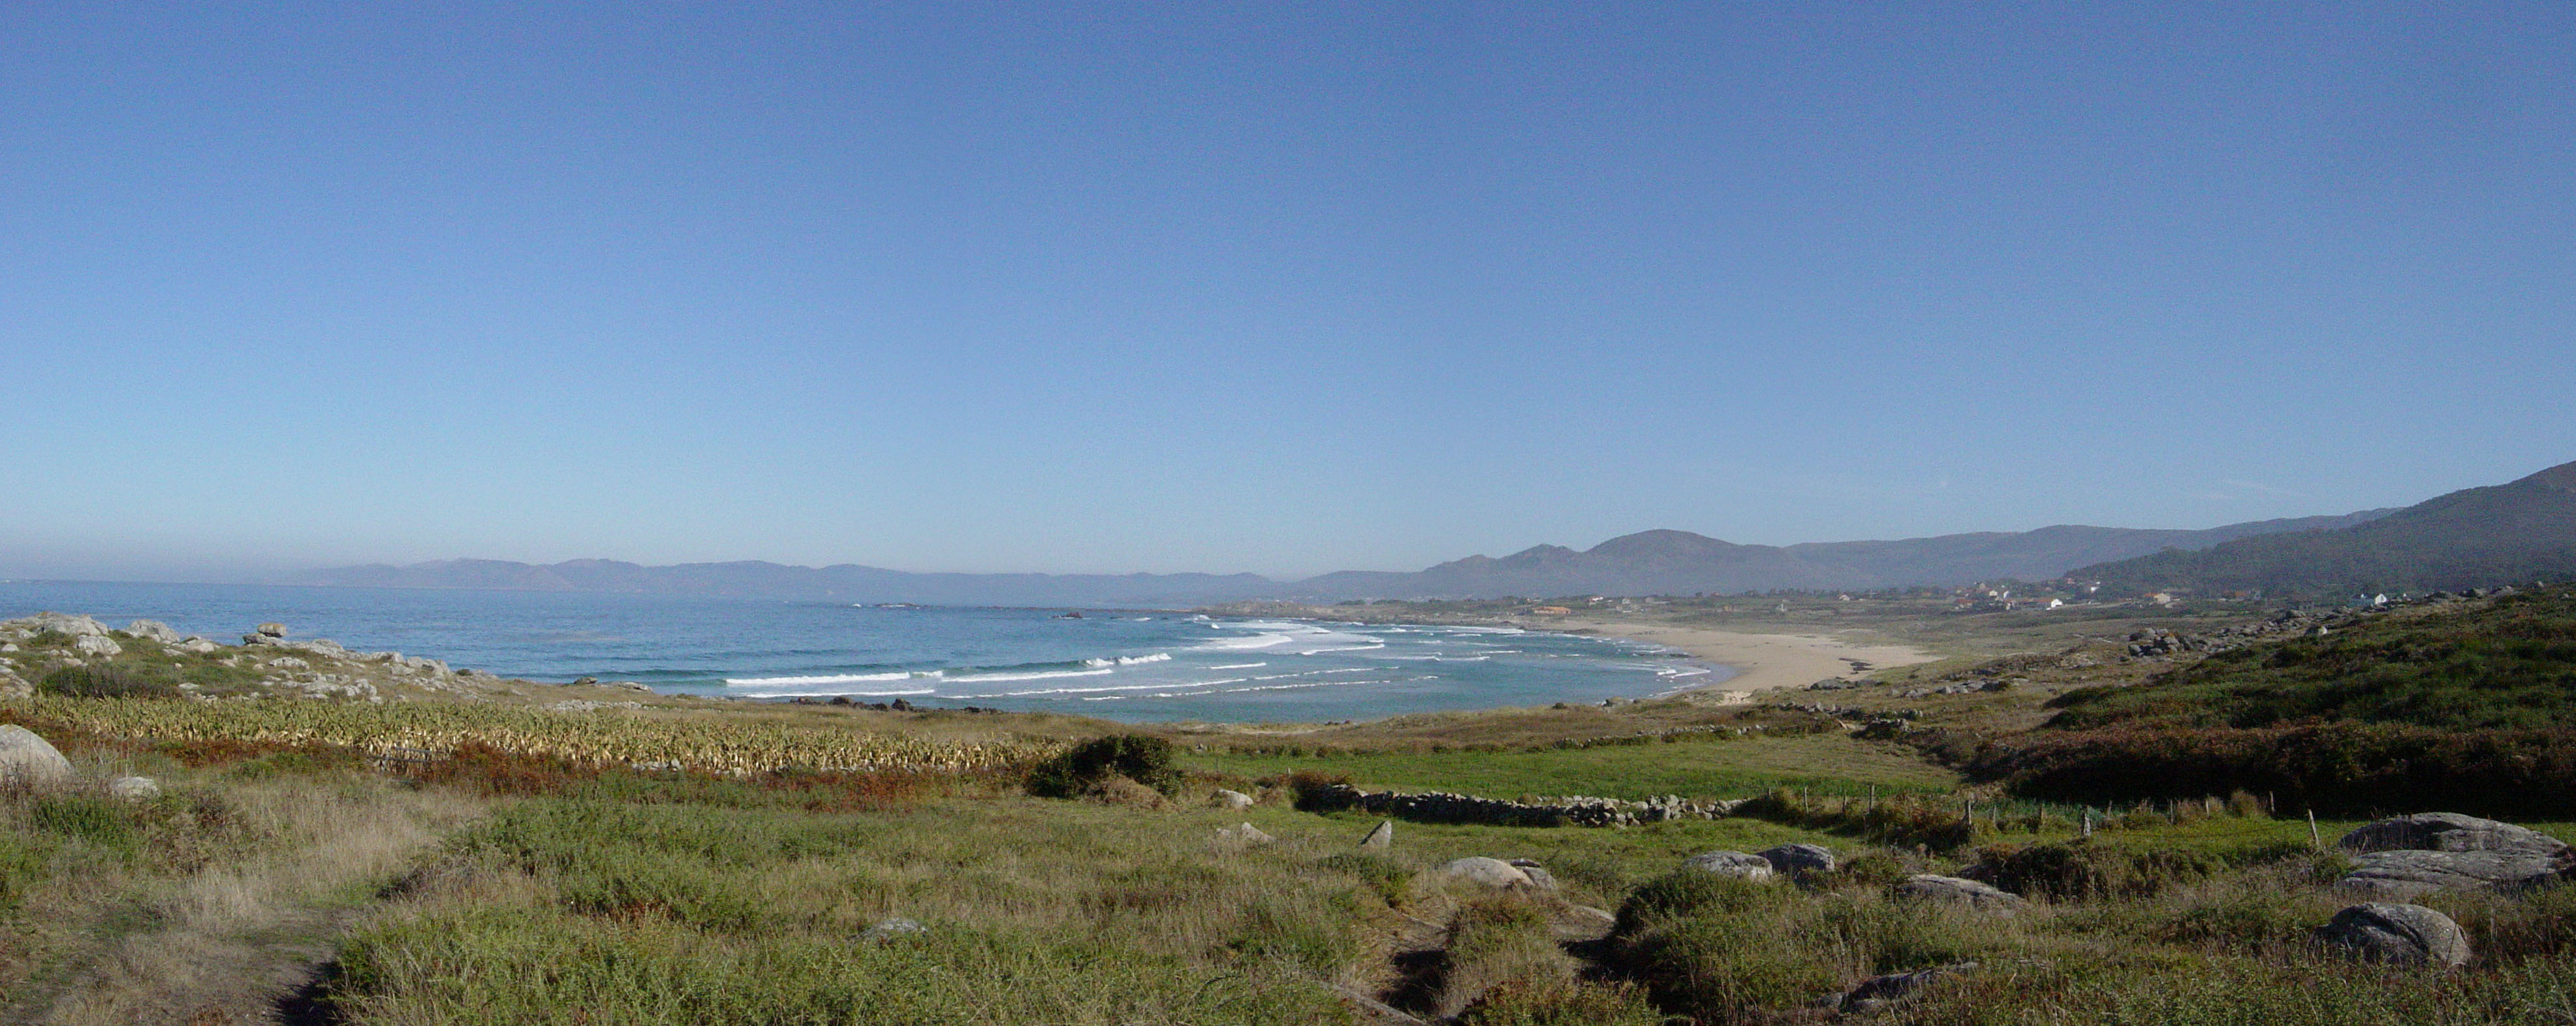 Foto playa Espiñeirido. Playa Espiñeirido